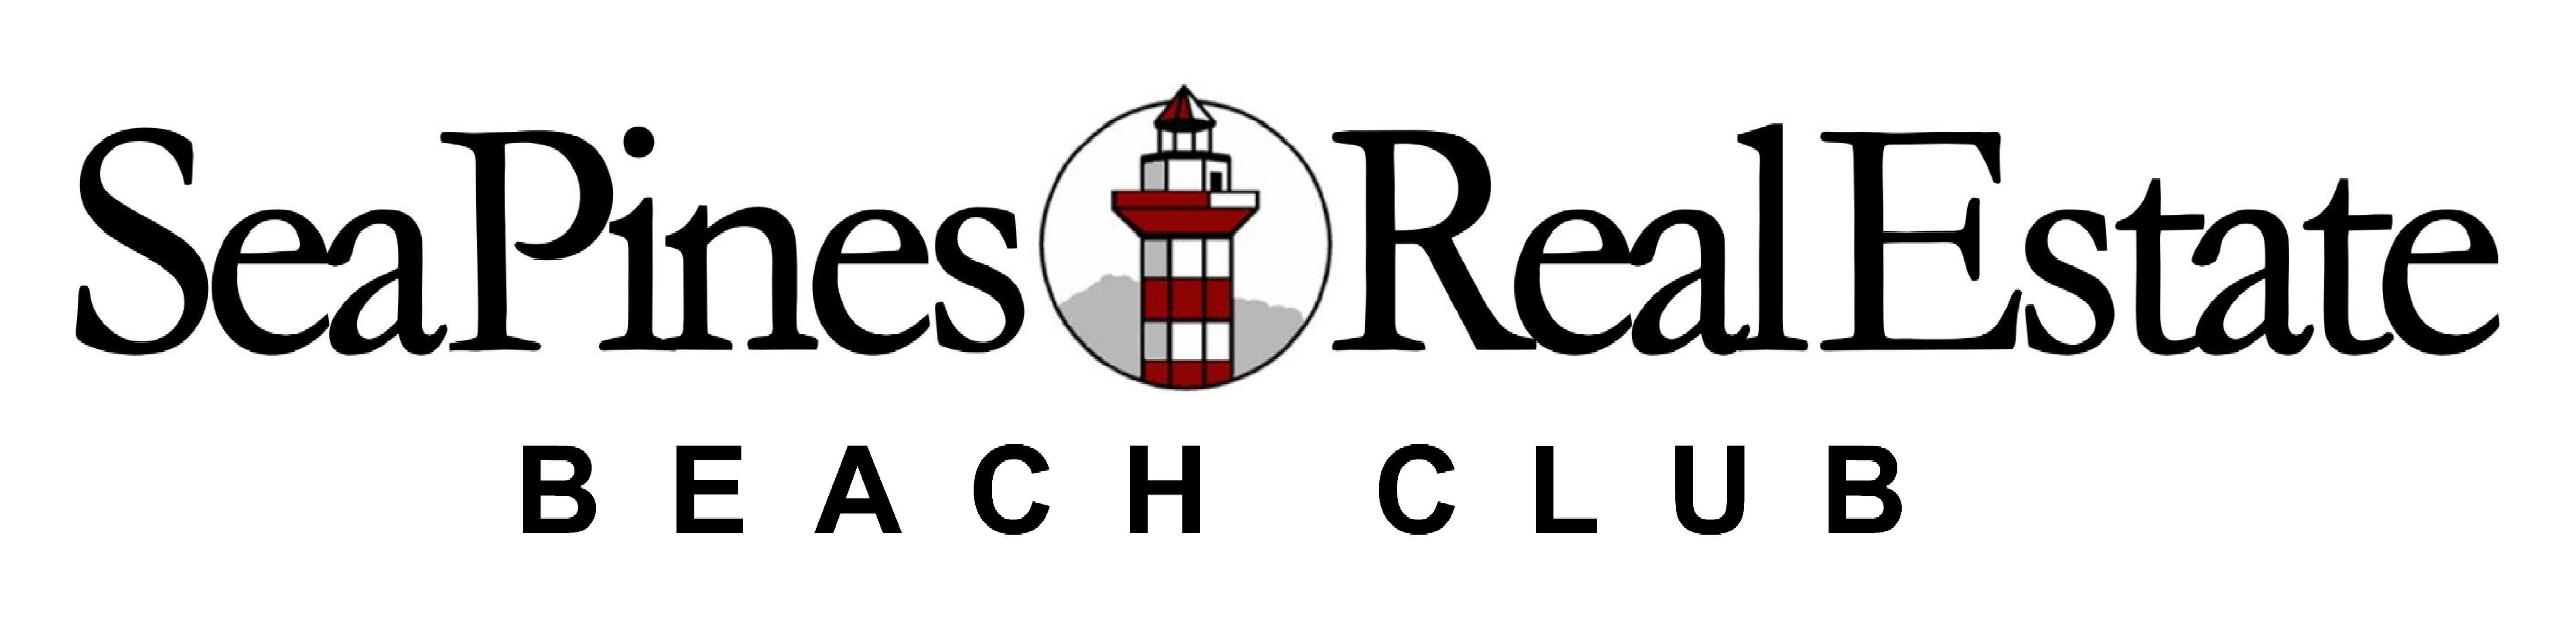 Sea Pines Real Estate - Beach Club